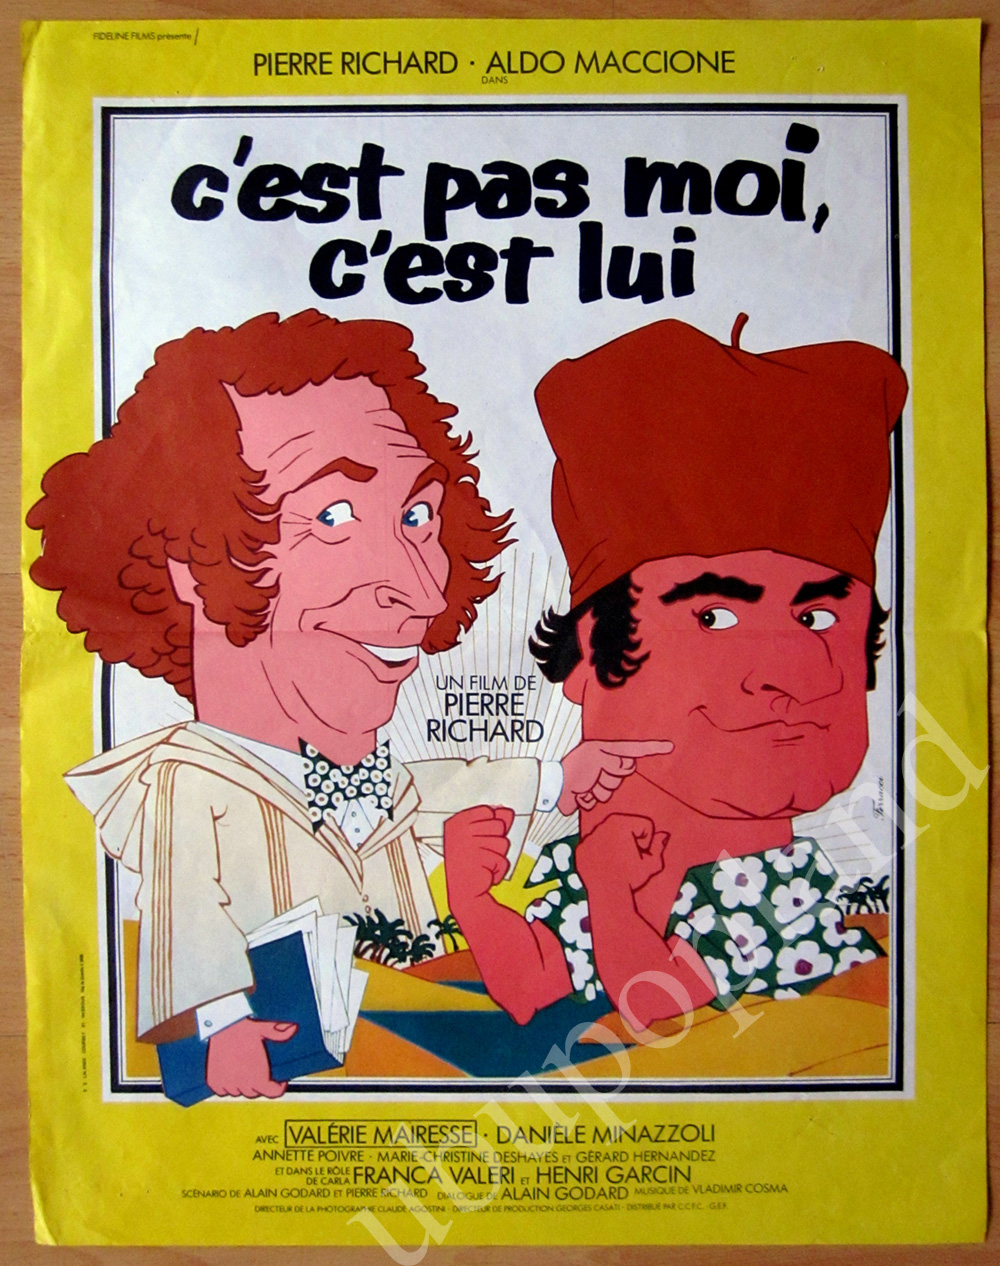 British Comedy Movie Posters  britposterscom